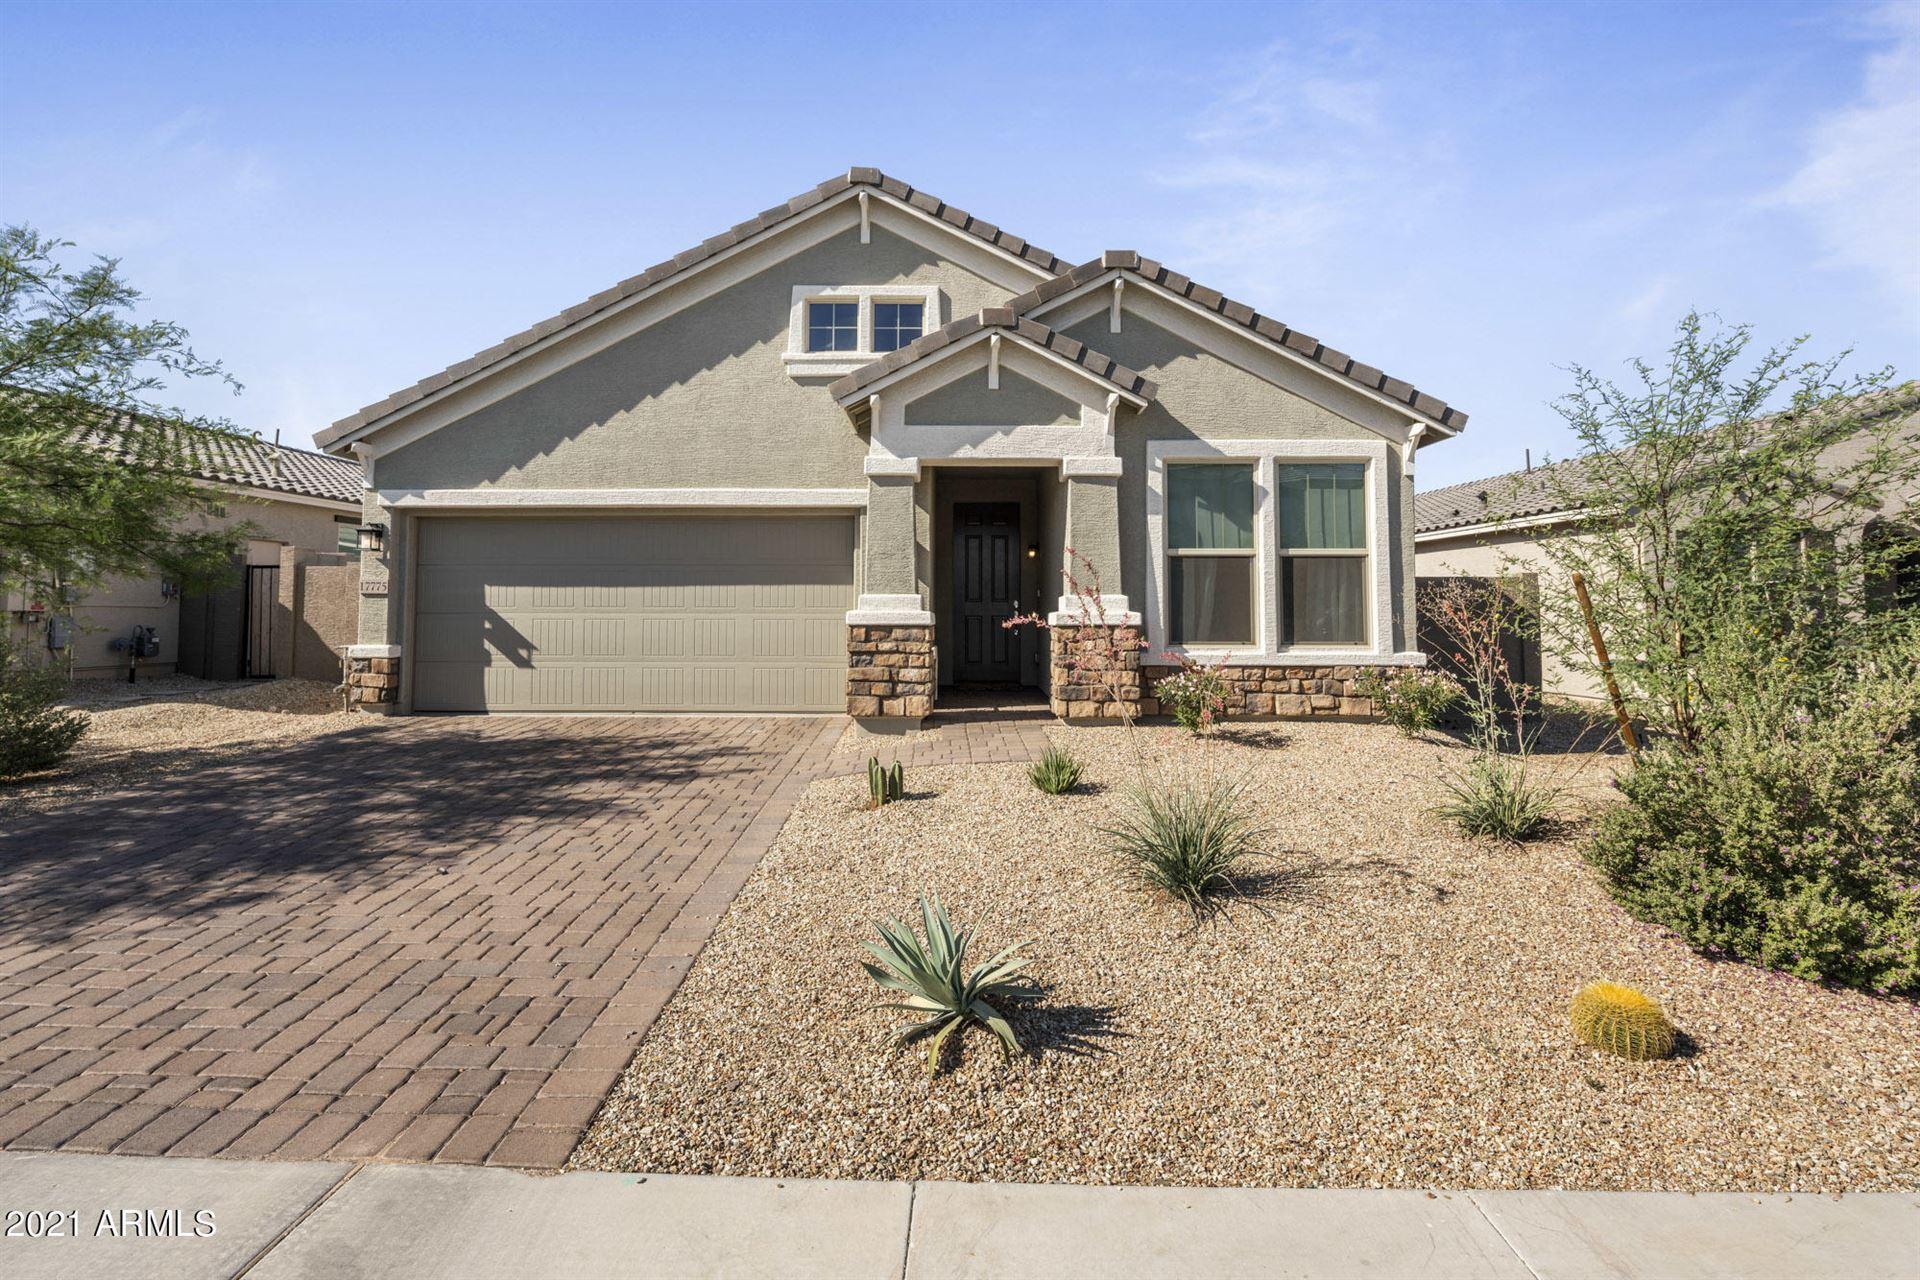 Photo of 17775 W Granite View Drive, Goodyear, AZ 85338 (MLS # 6247339)